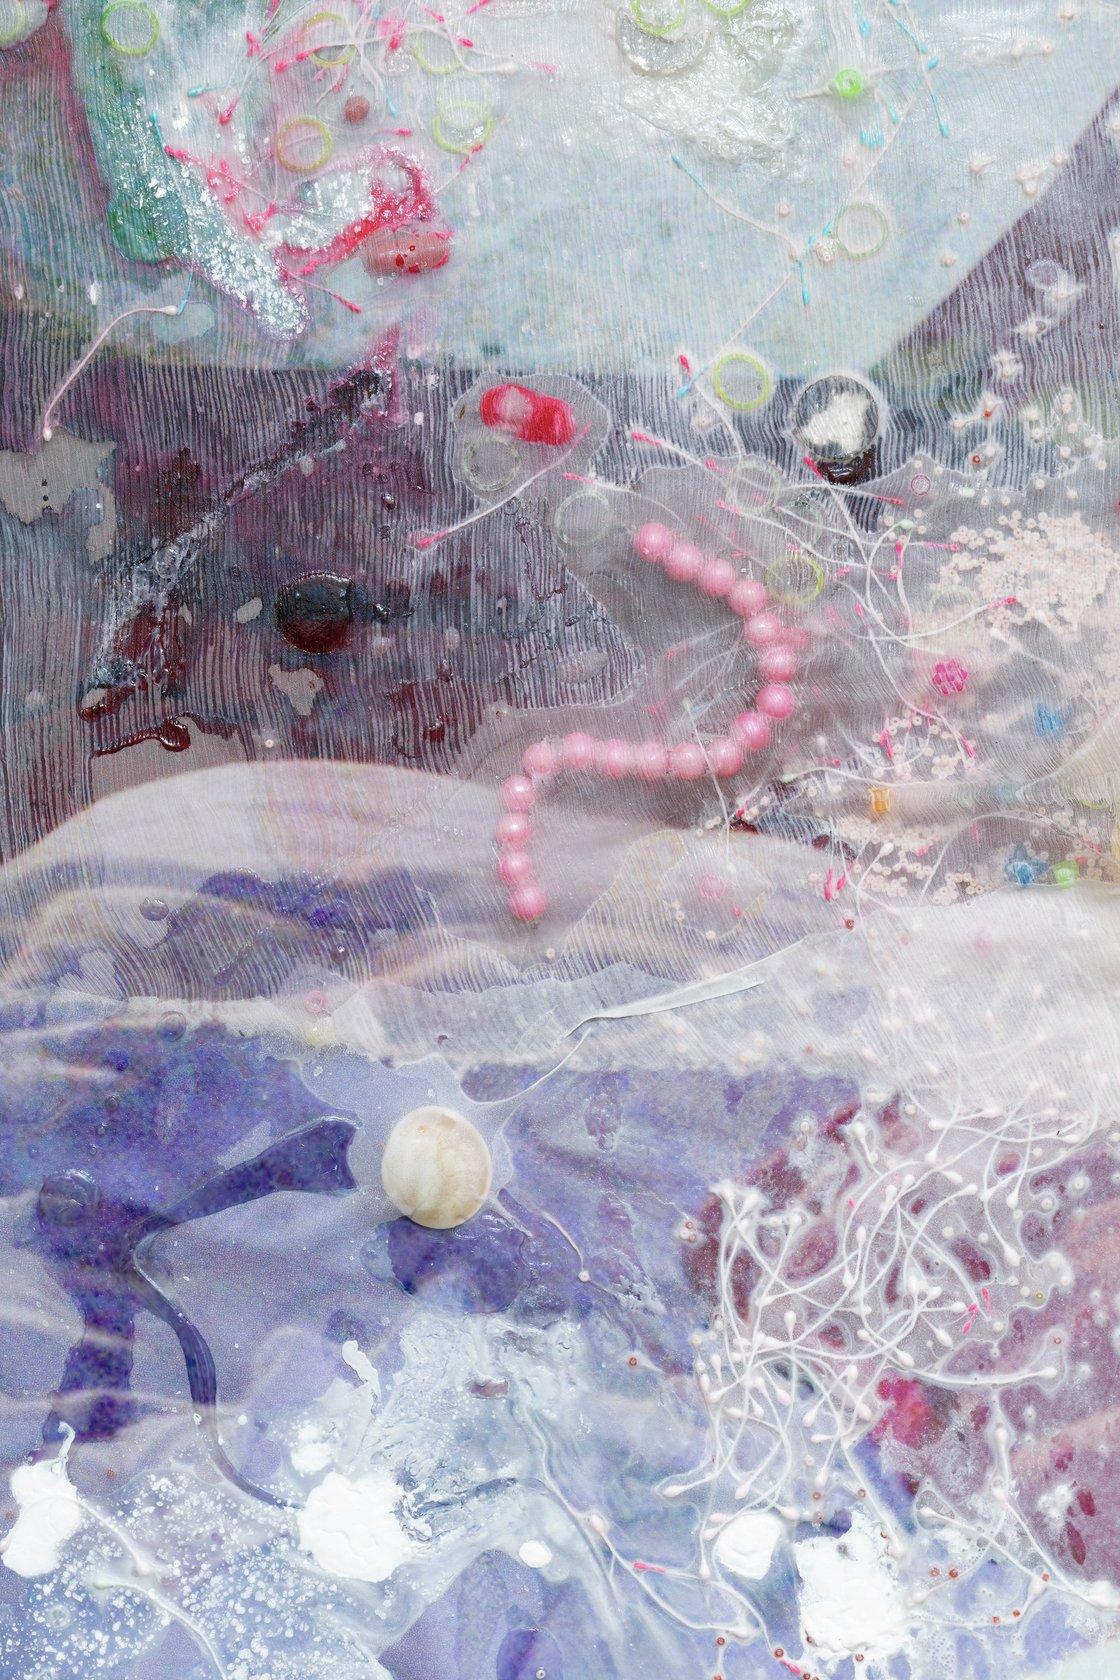 Mimosa Echard, Numbs (Egg), 2021